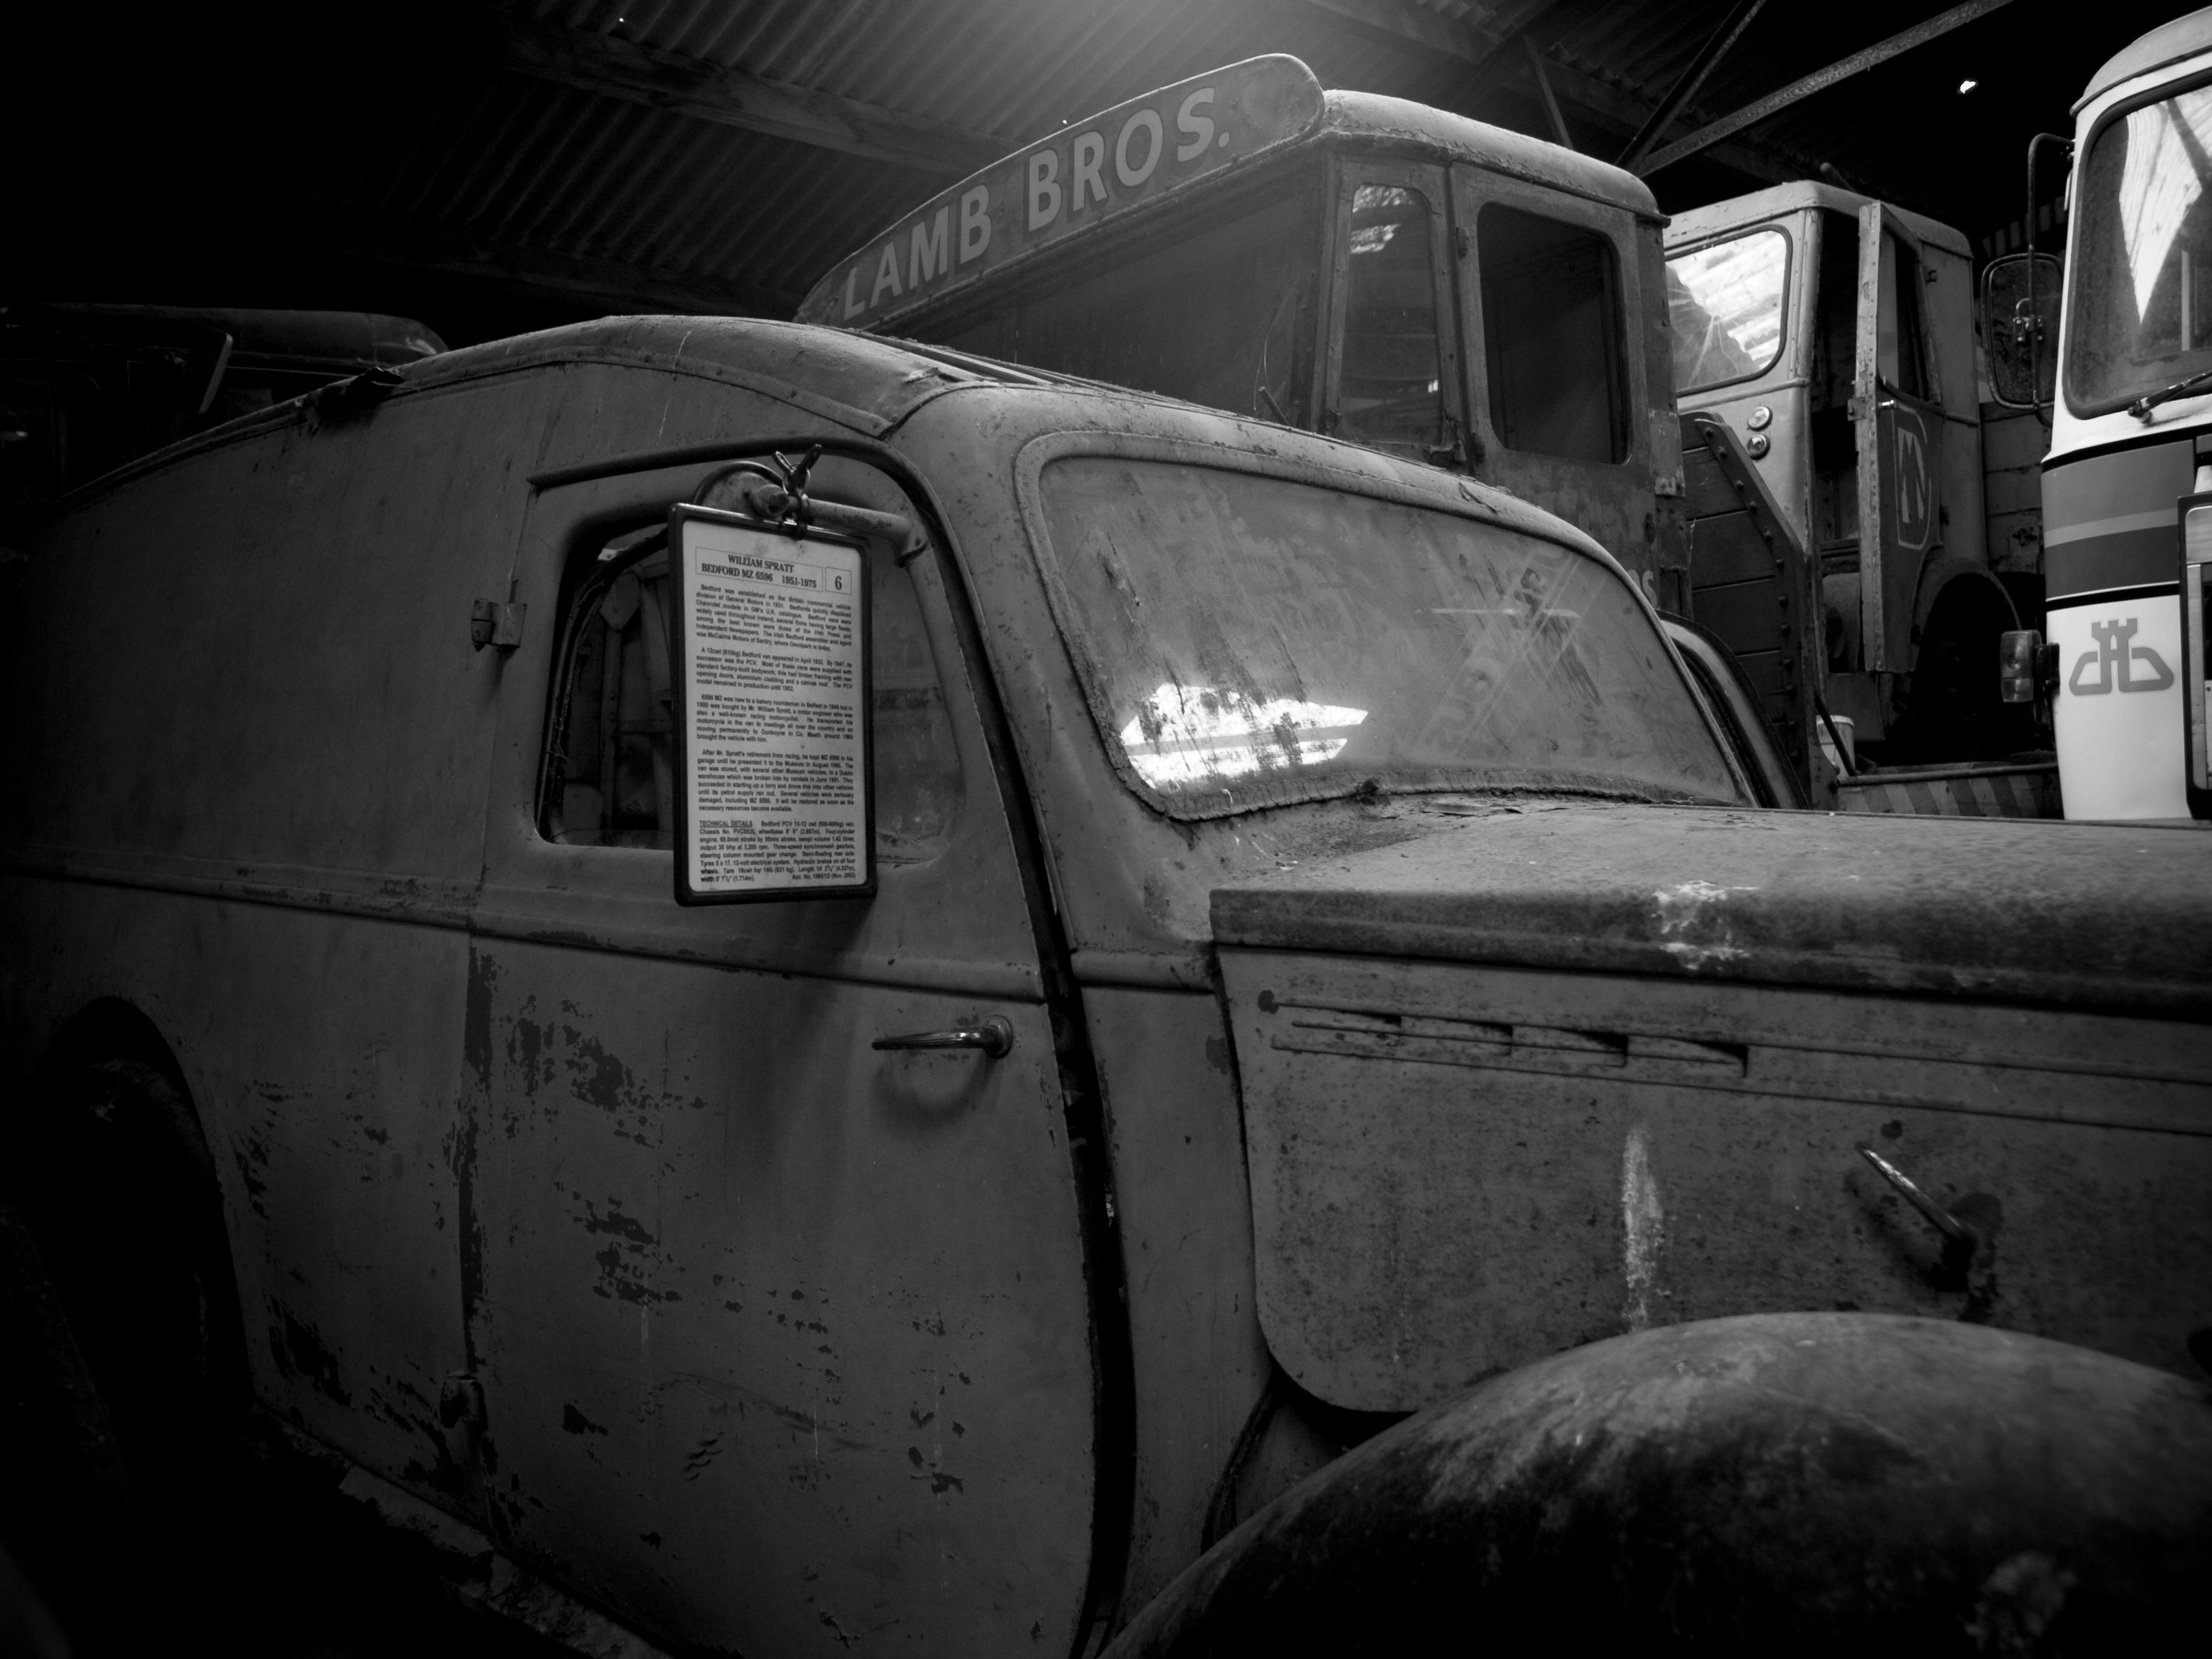 National Transport Museum - Howth, Dublin, Blackandwhite, Car, Dublin, Monochrome, HQ Photo